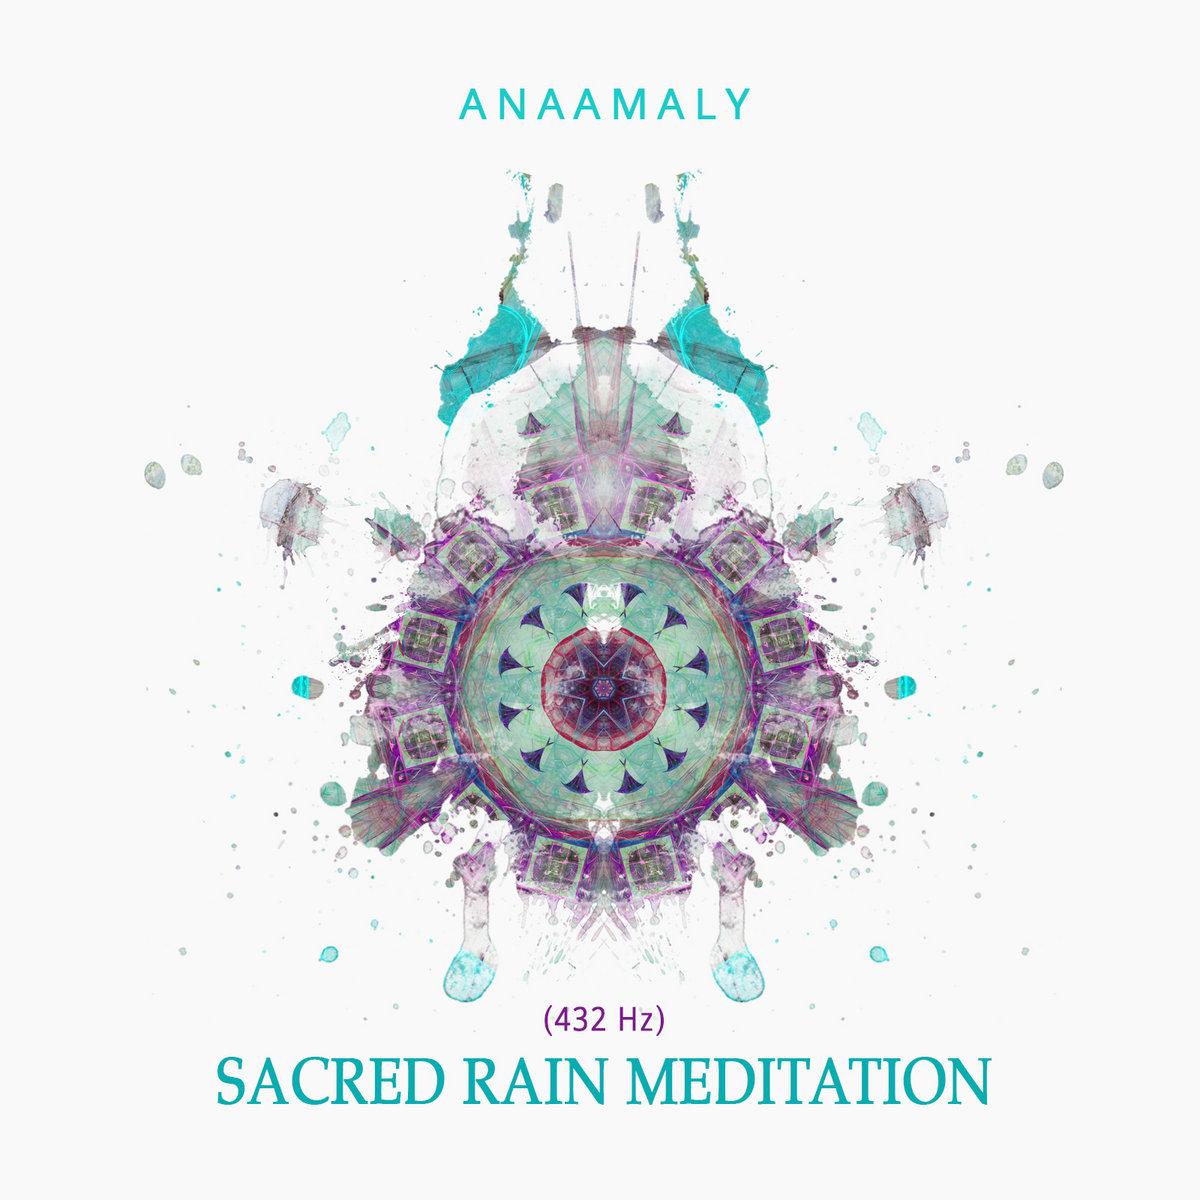 Sacred Rain Meditation (432 Hz) | ANAAMALY